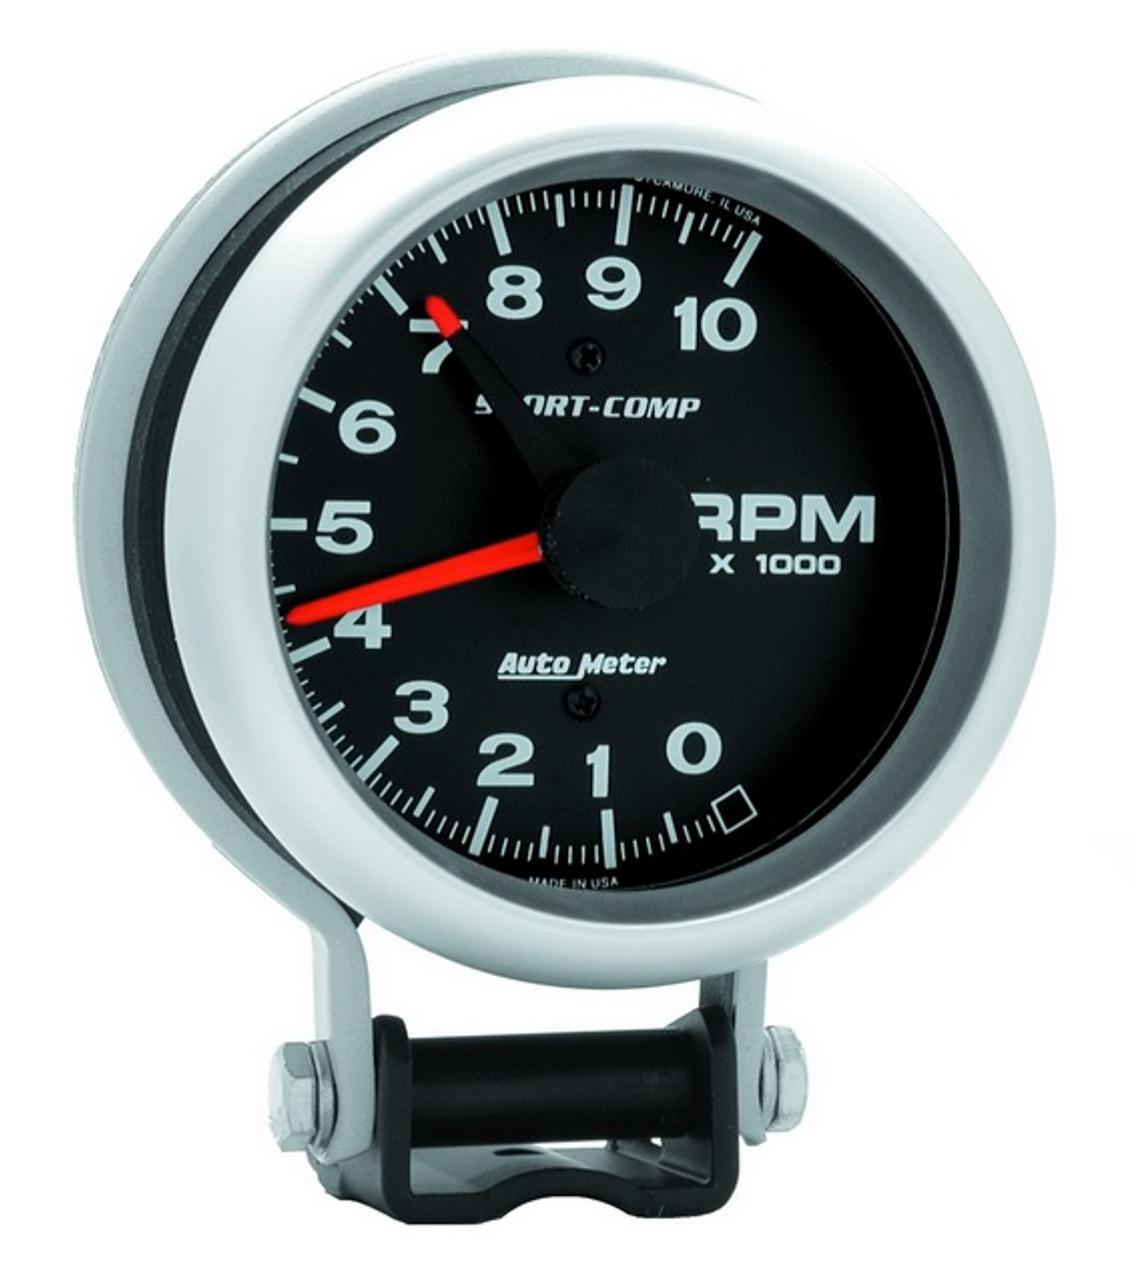 Autometer Sport Comp Tach Wiring Diagram